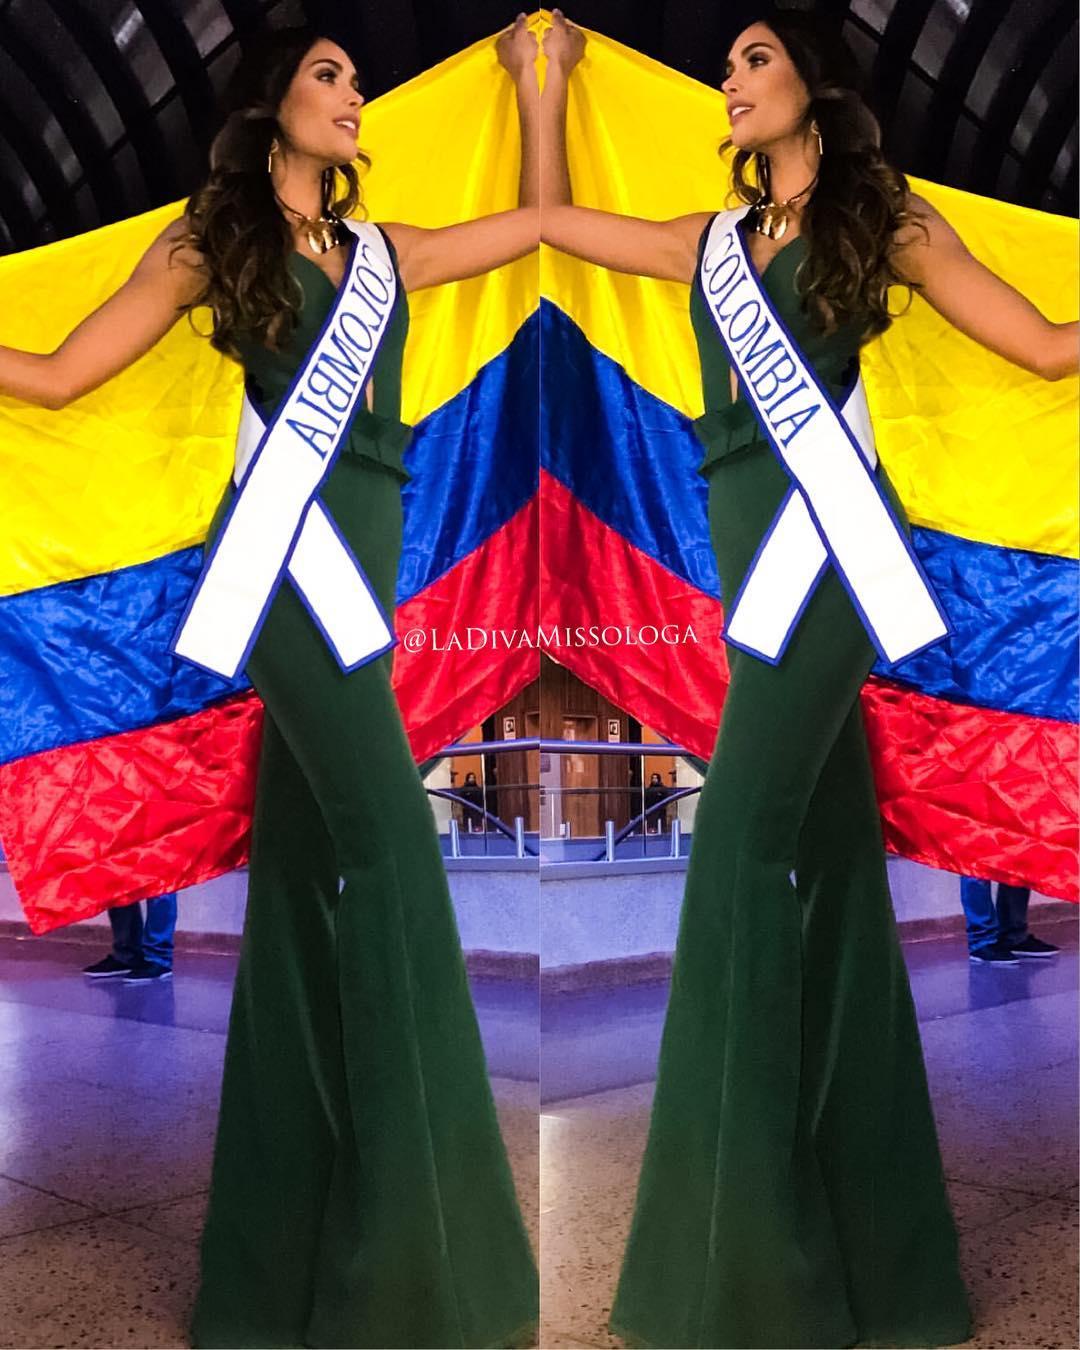 vanessa pulgarin, miss international colombia 2017. - Página 3 22639259_495861150780756_3018500889619988480_n